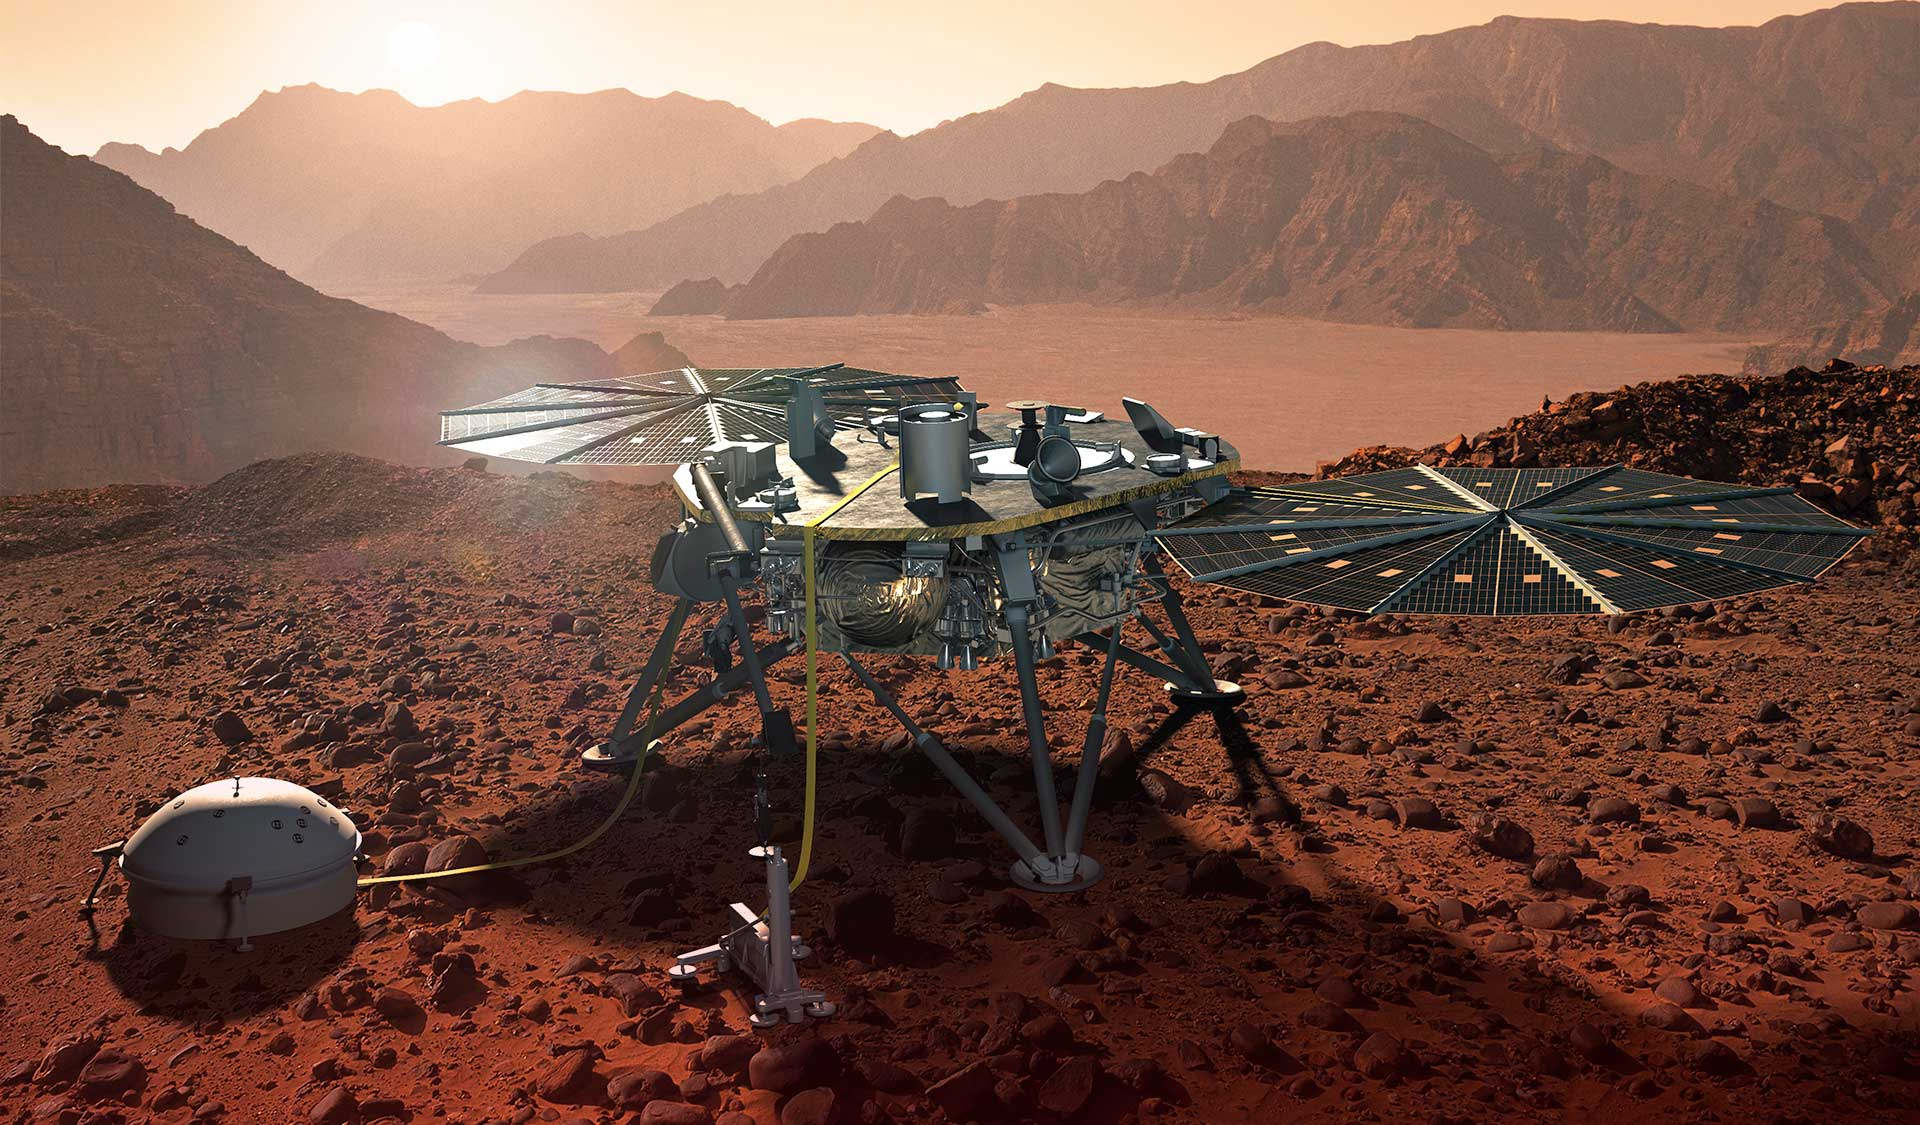 mars mission nasa - HD1600×938